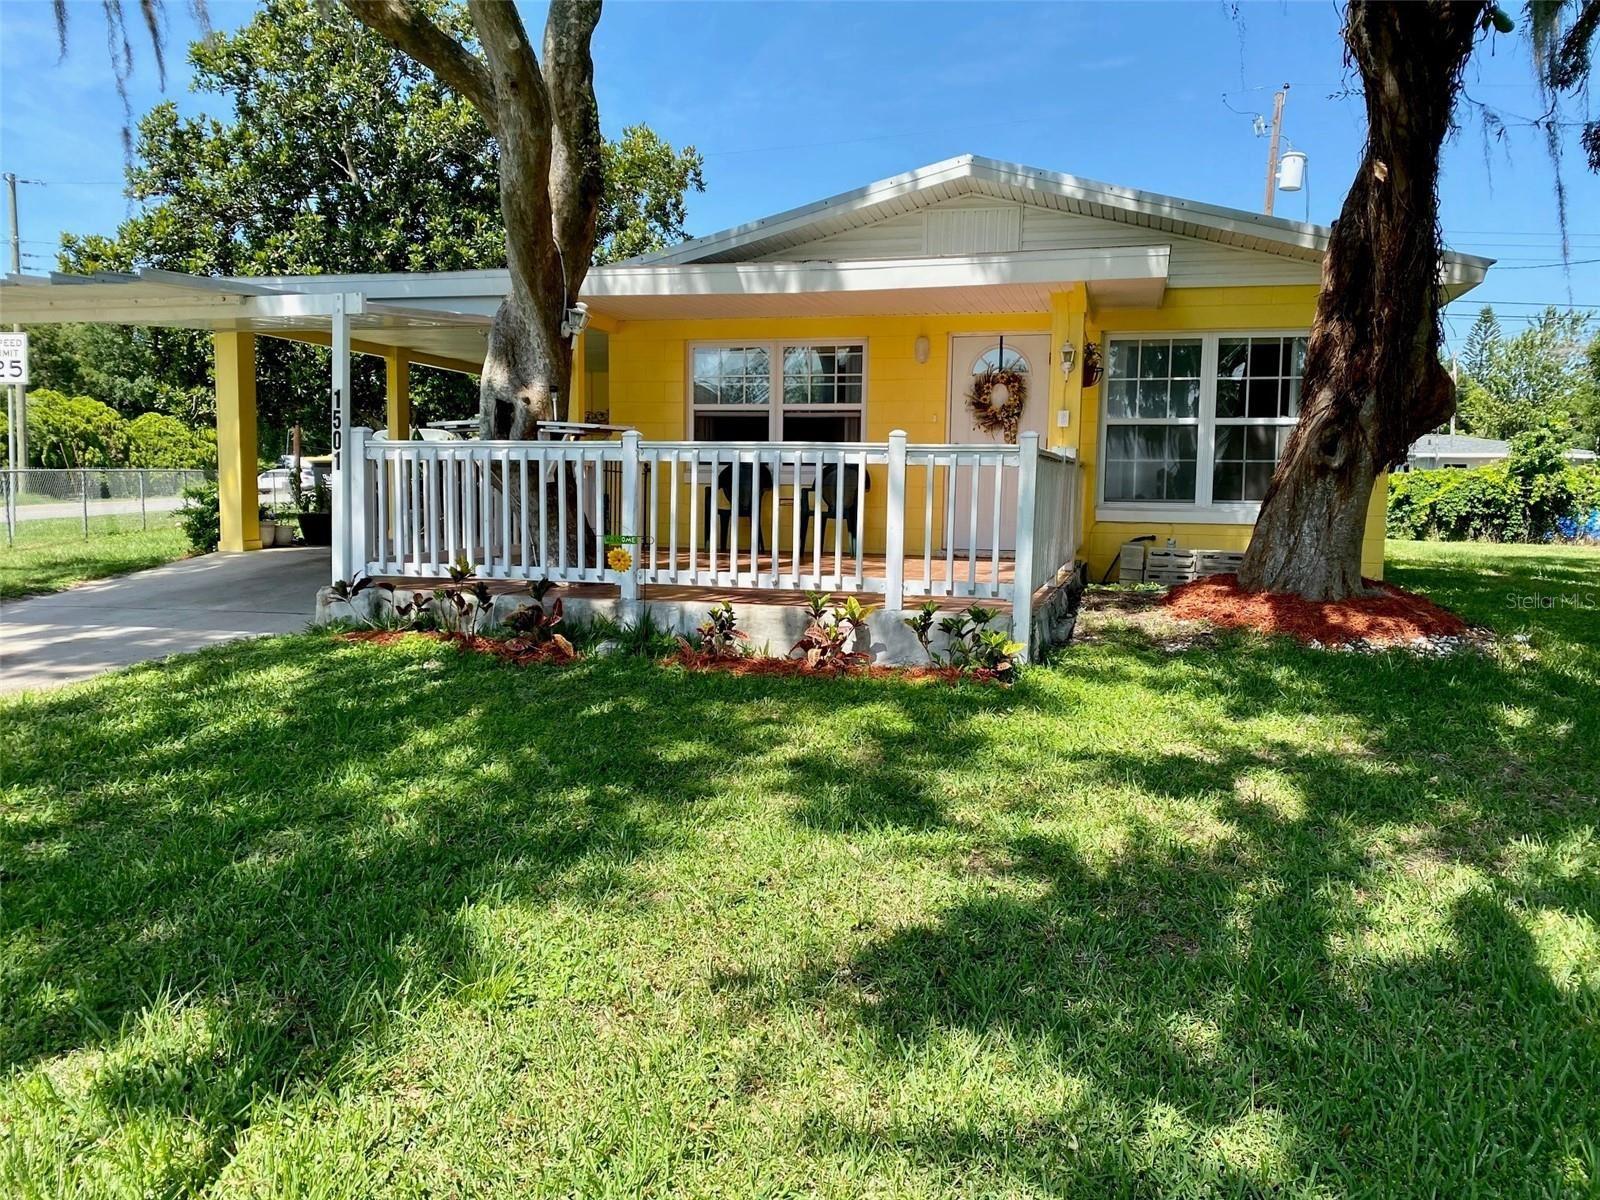 1501 W LAKE CANNON DR NW, Winter Haven, FL 33881 - #: P4915588